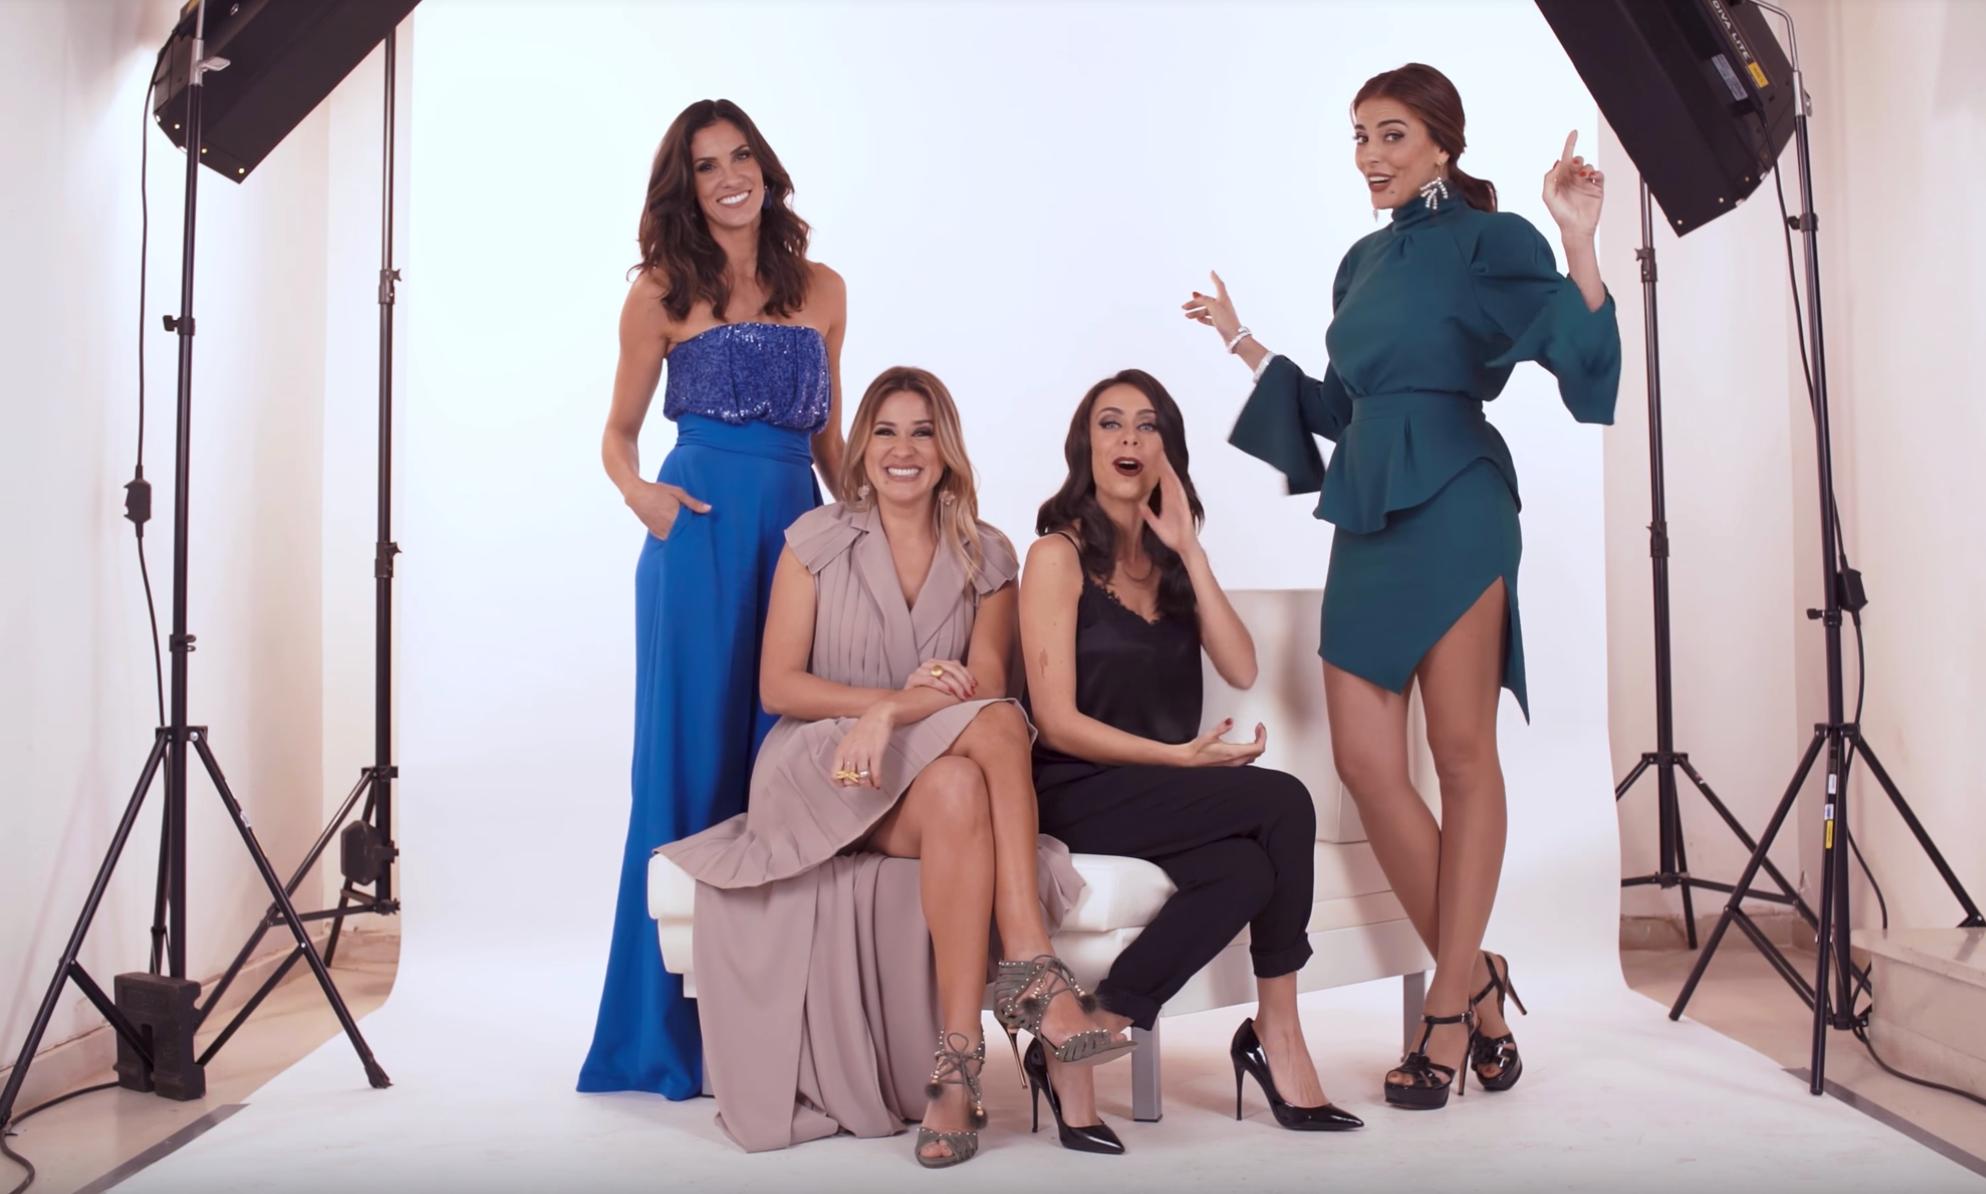 Eurovision 2018 presenters